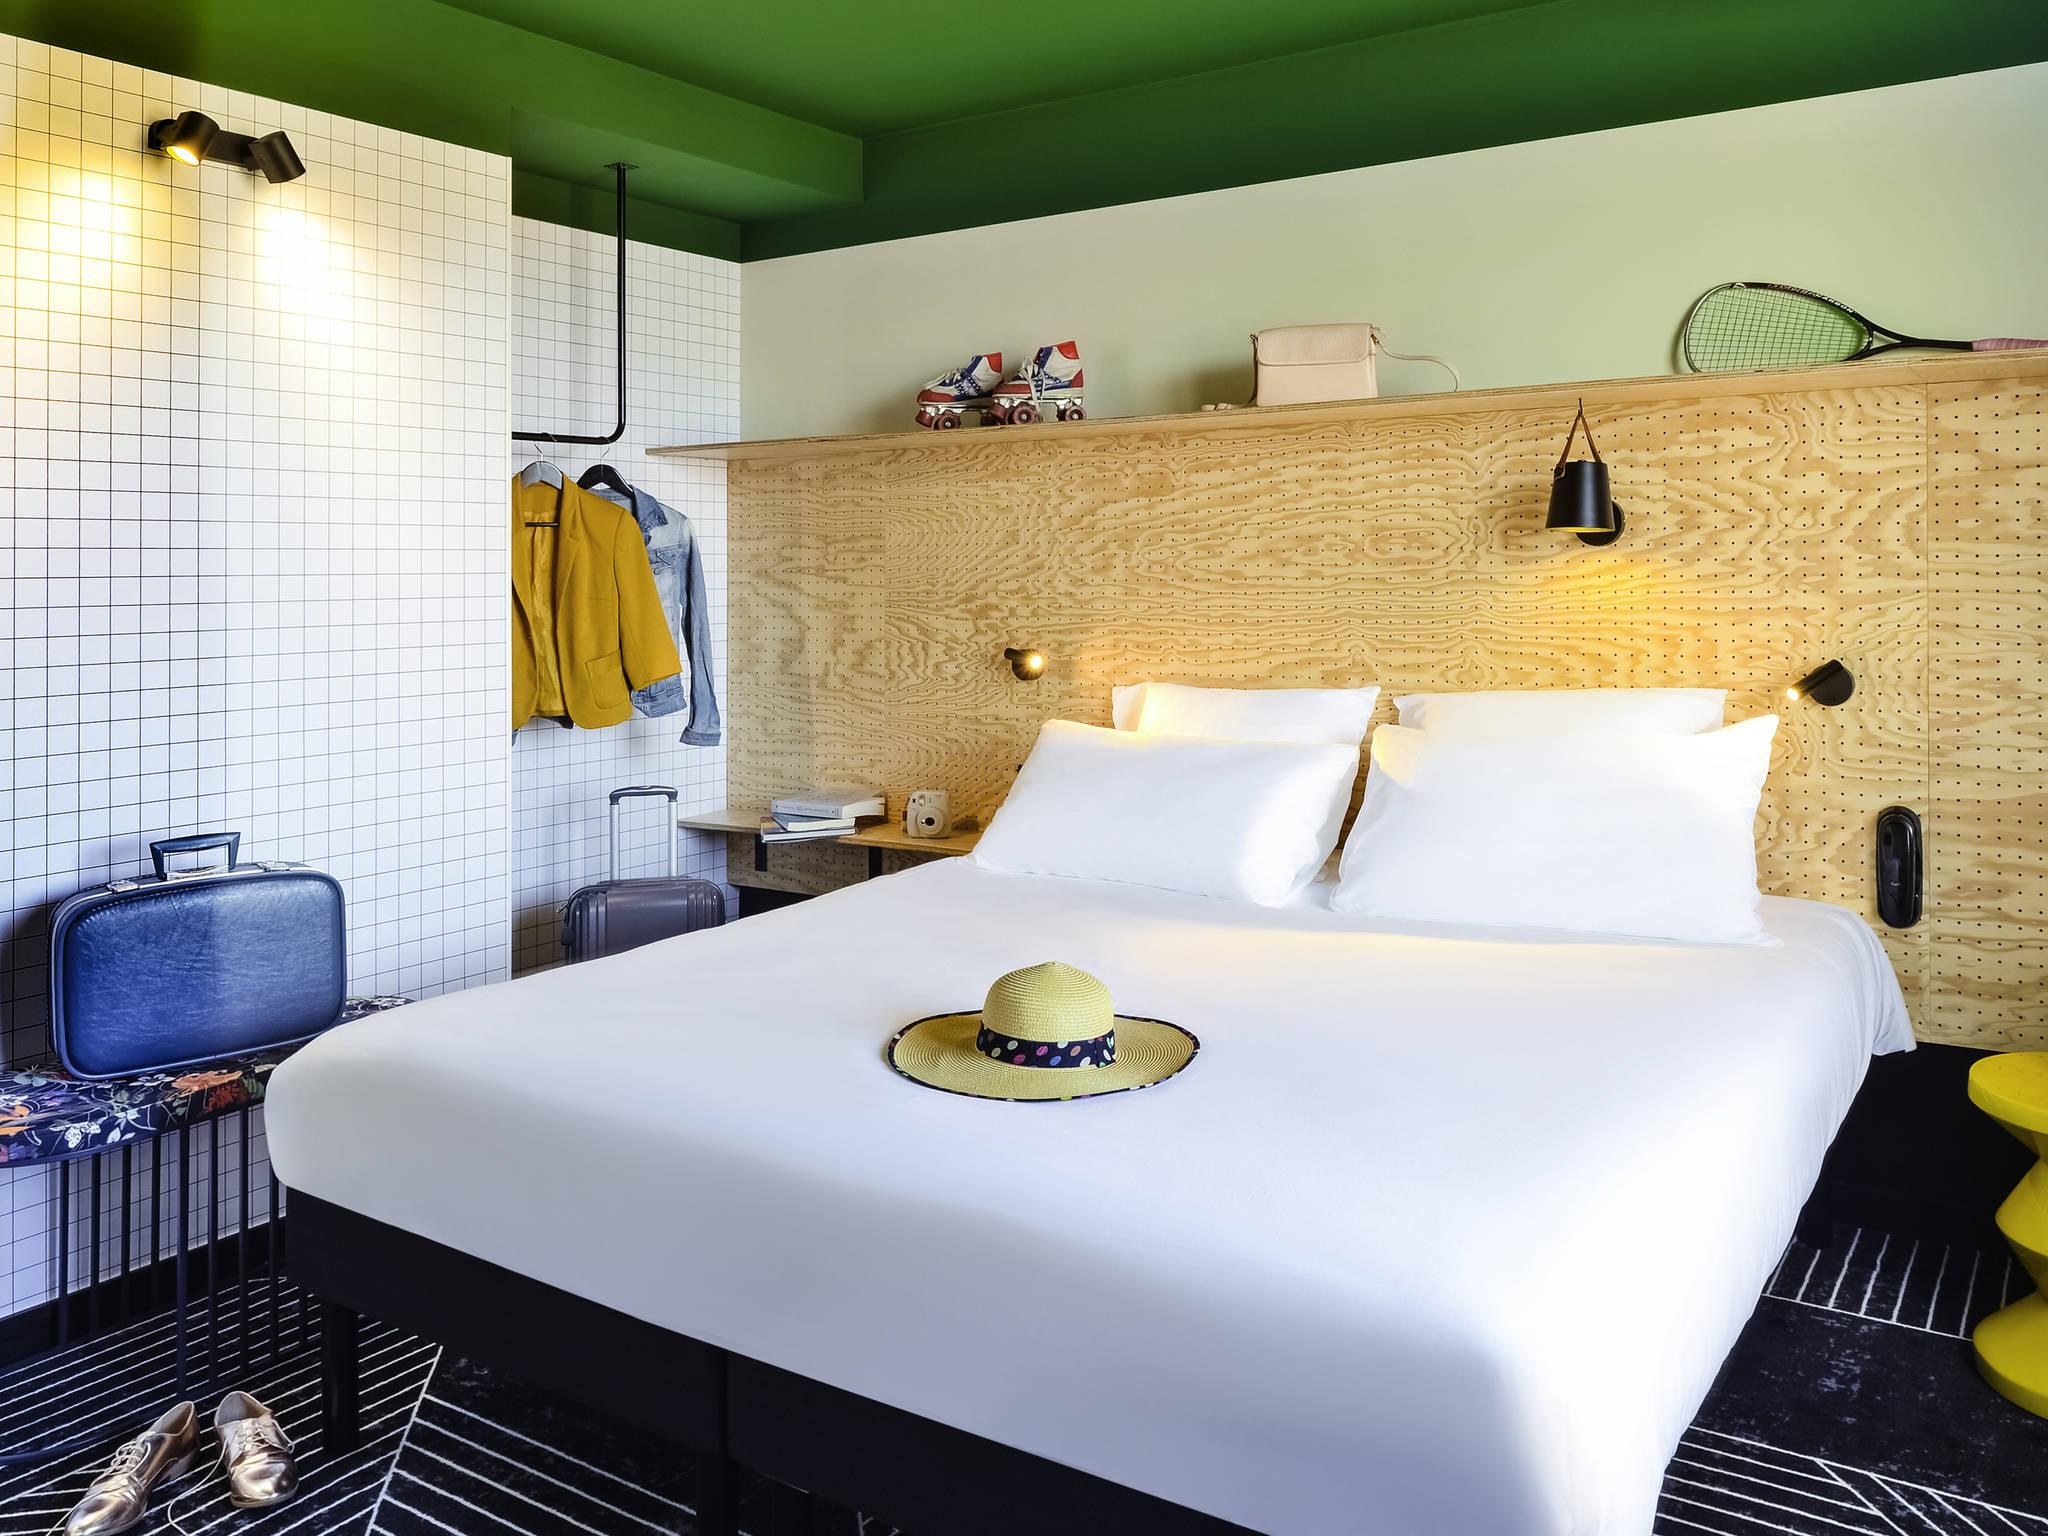 Hotel a meyzieu ibis styles lyon meyzieu stadium olympique